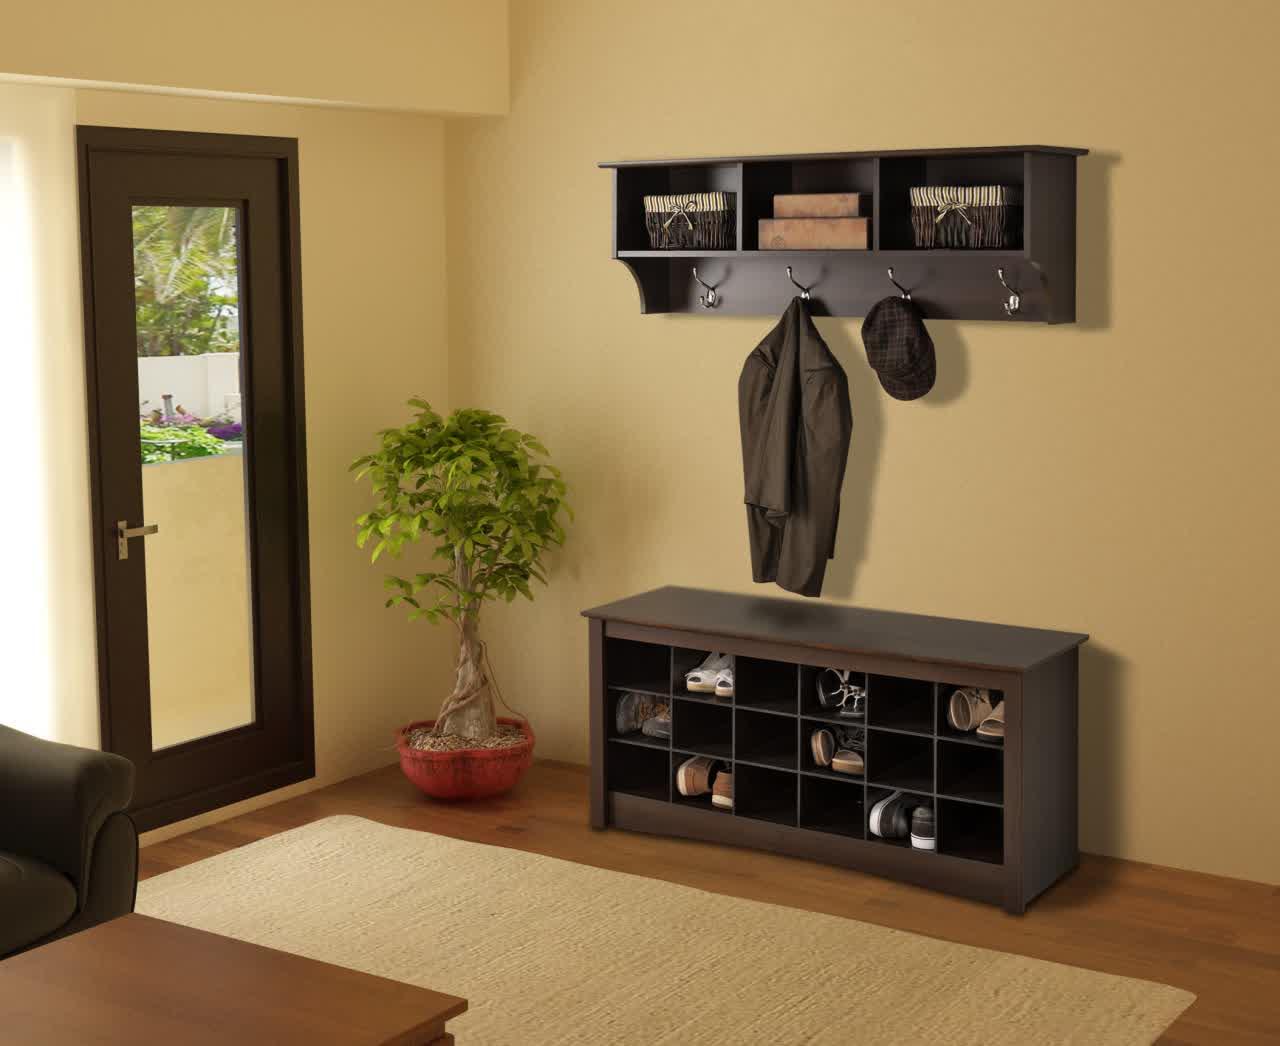 title | Living Room Shoe Storage Ideas